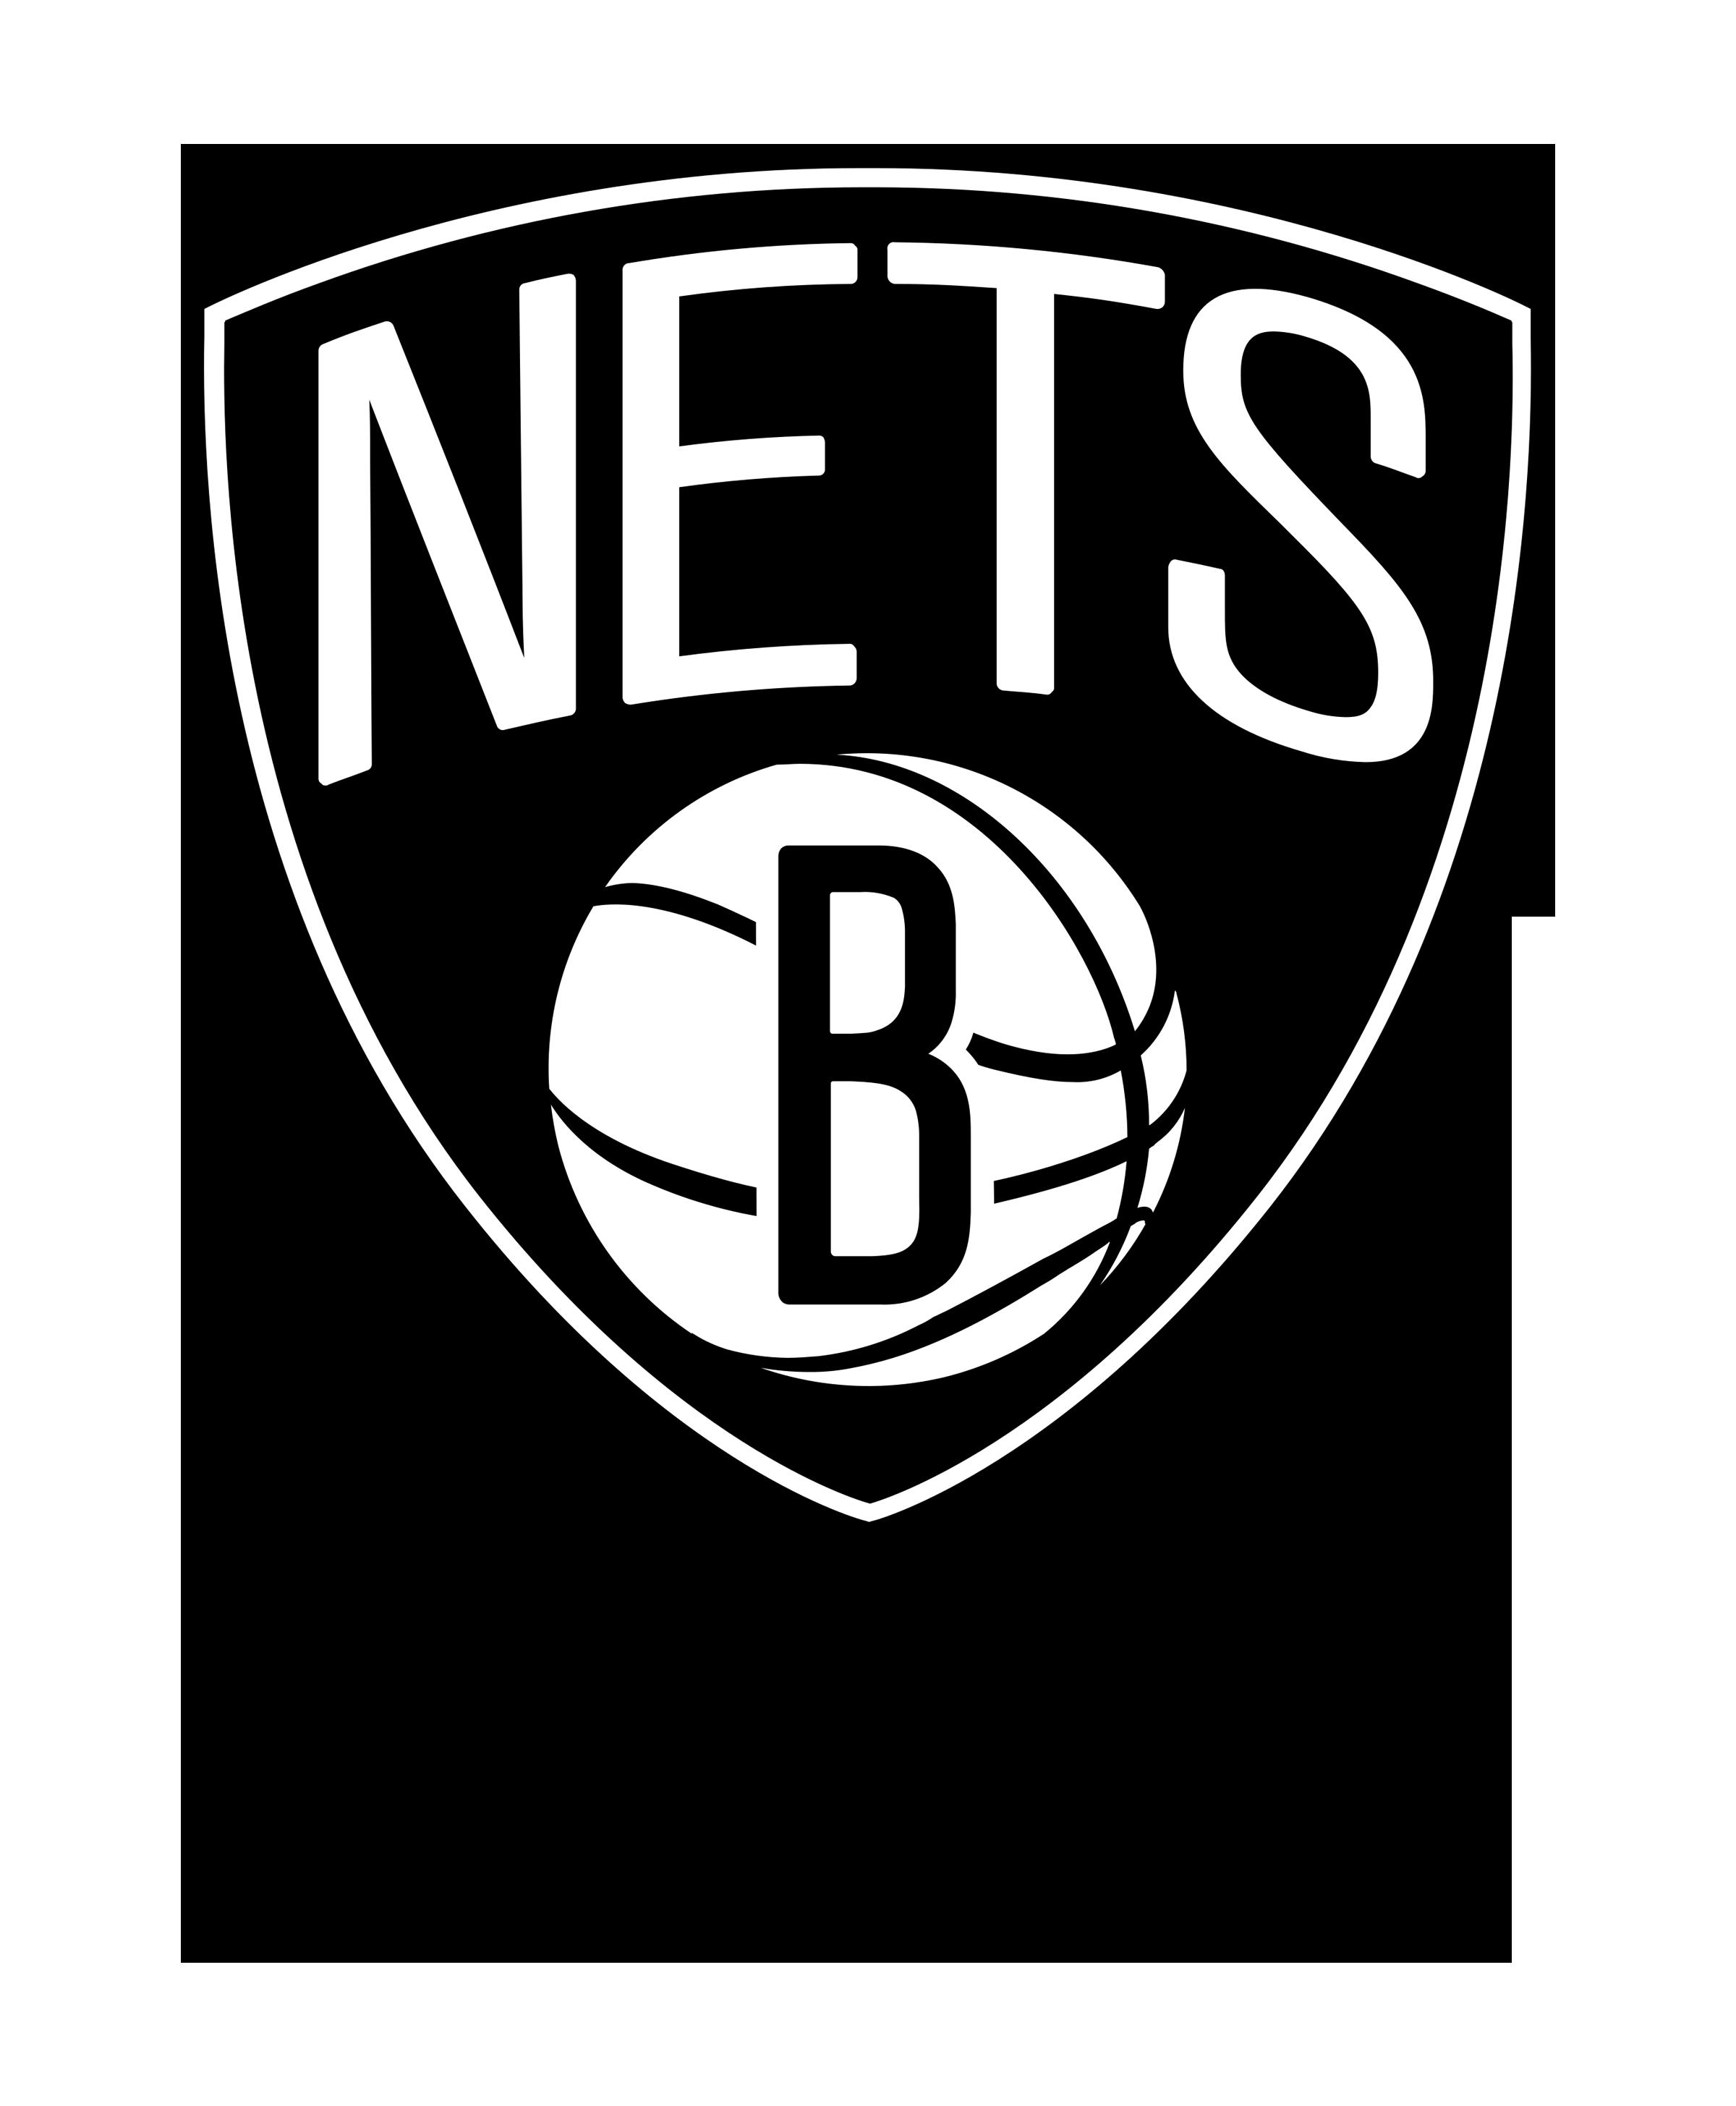 Brooklyn Nets Logo Transparent - Brooklyn Nets, Transparent background PNG HD thumbnail